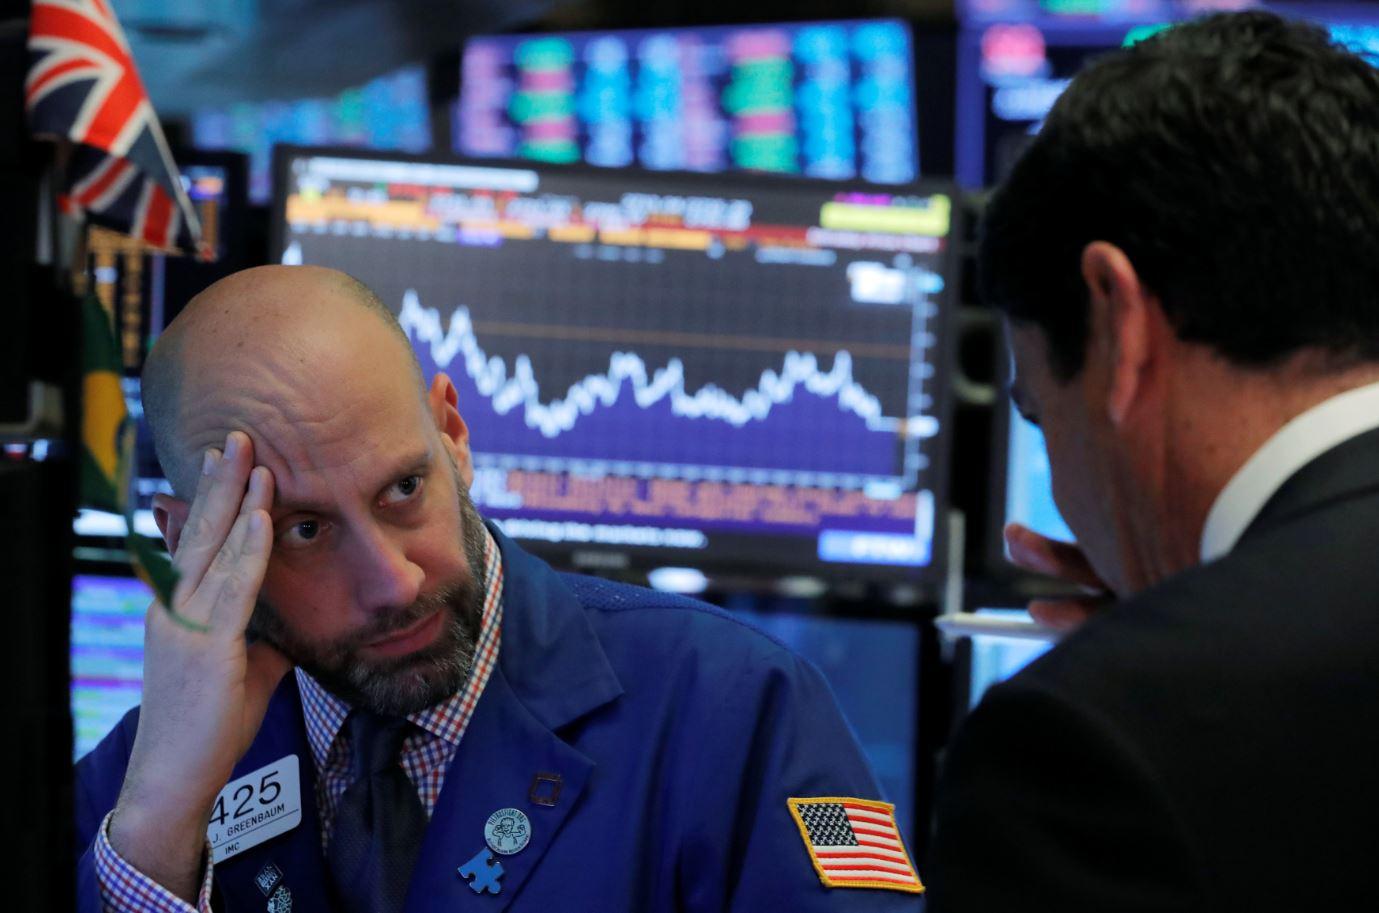 Tiemblan índices de Wall Street